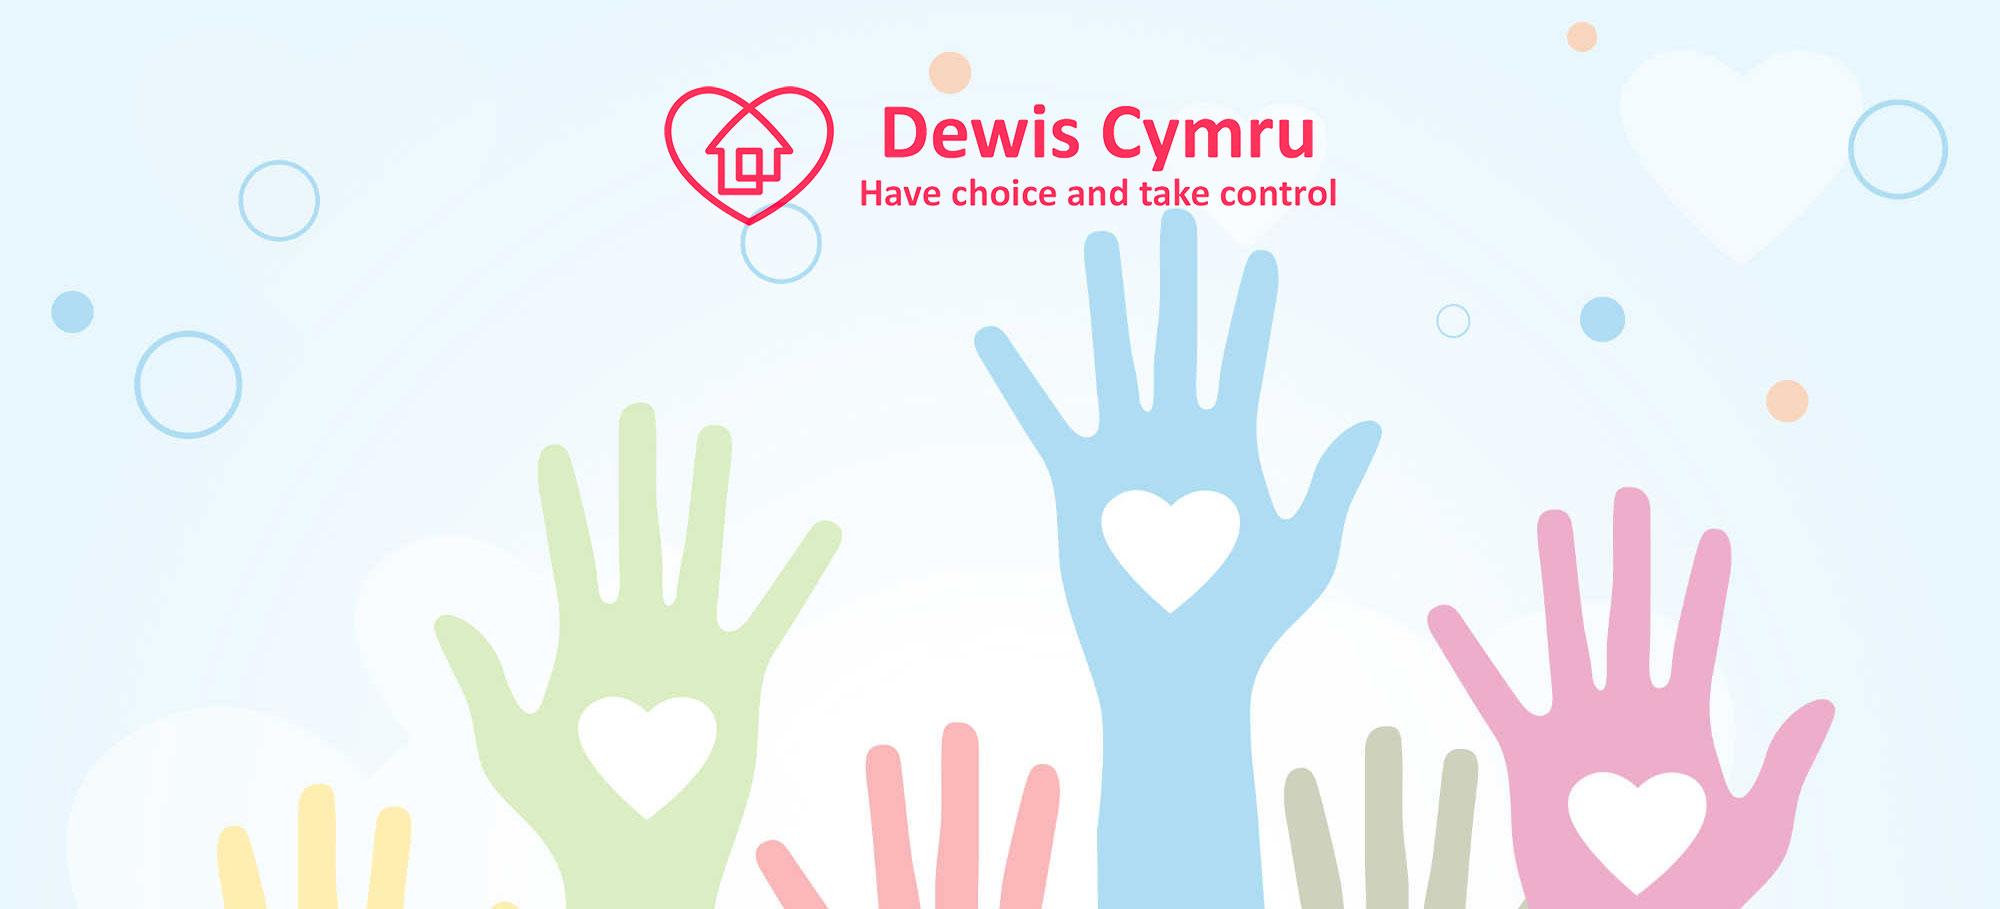 Dewis Cymru Slide